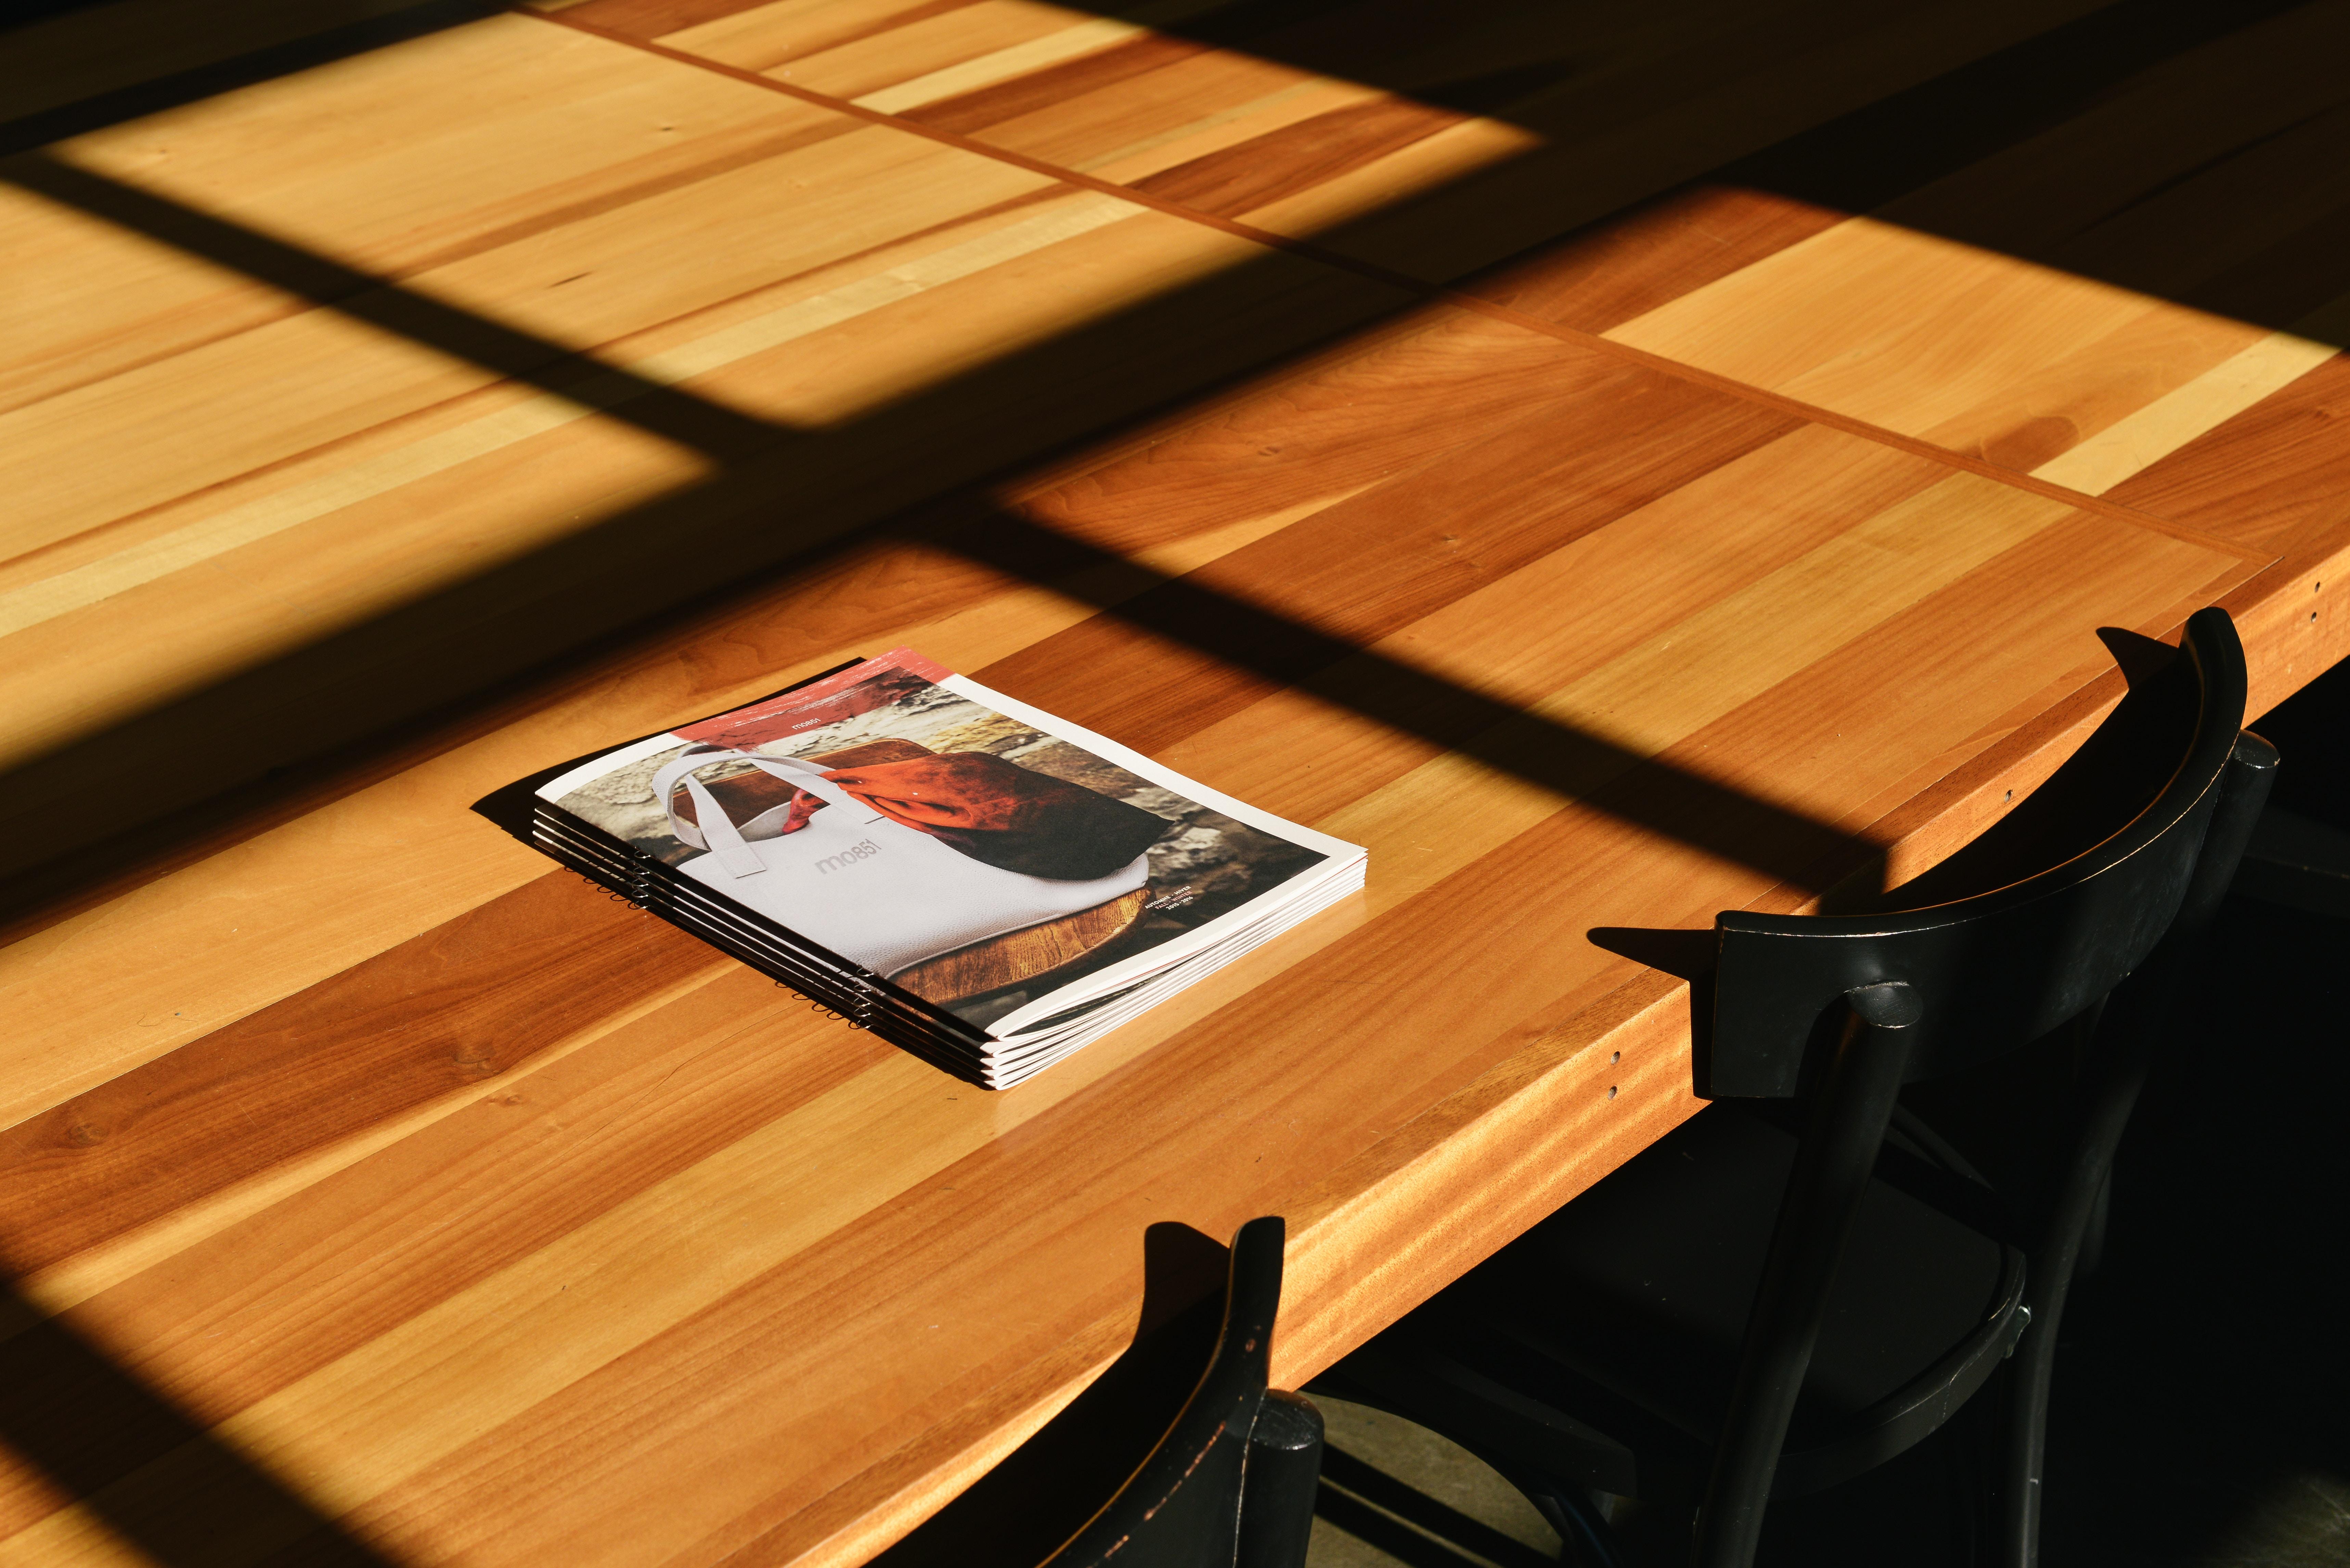 Best Interior Design Magazines to Find Bathroom Decor Inspirations m0851 55531 unsplash